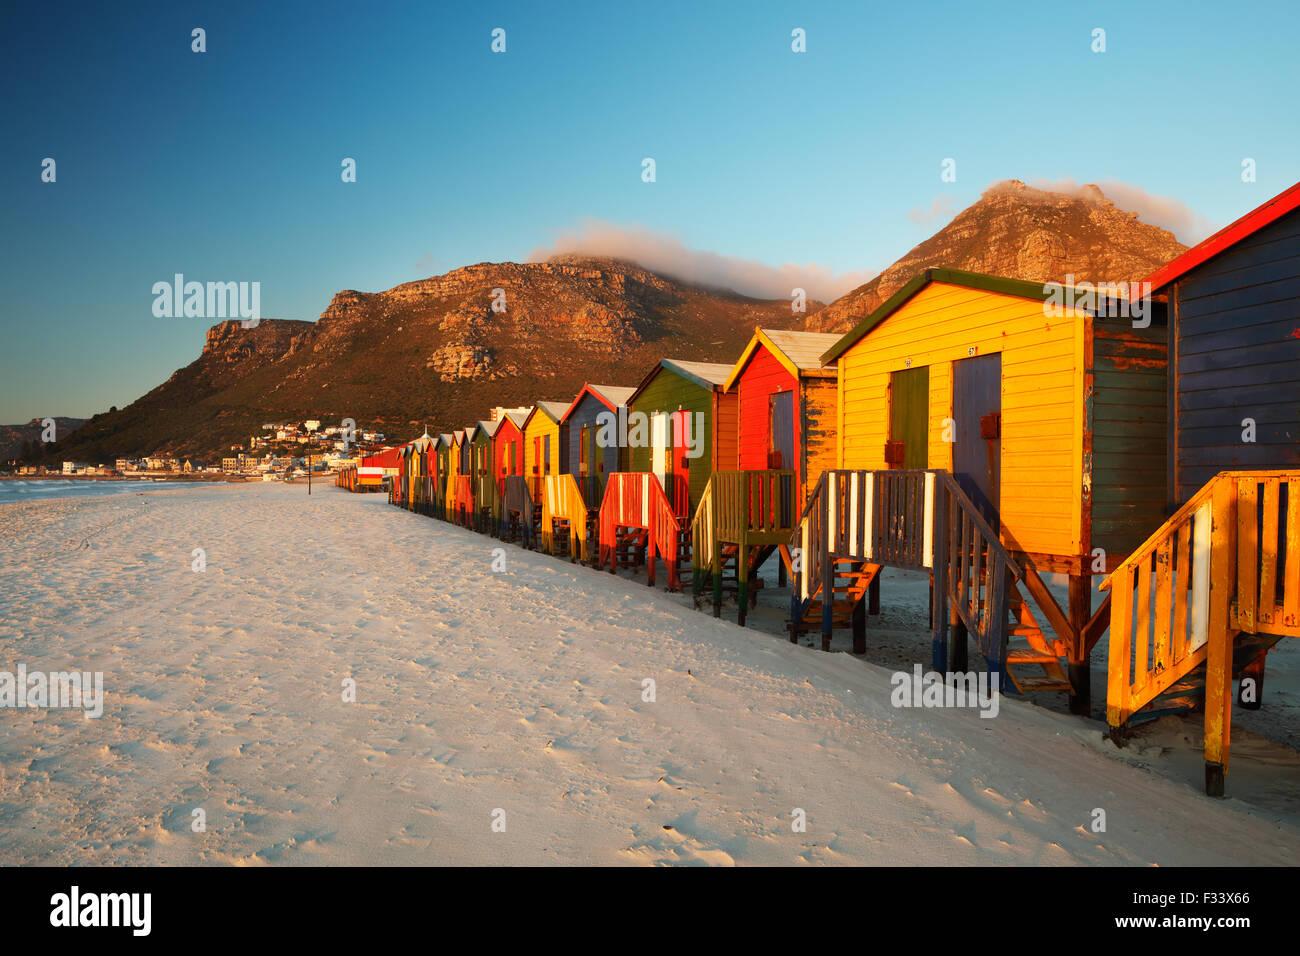 Cabañas de playa en Muizenberg Beach, Cape Town, Sudáfrica Imagen De Stock